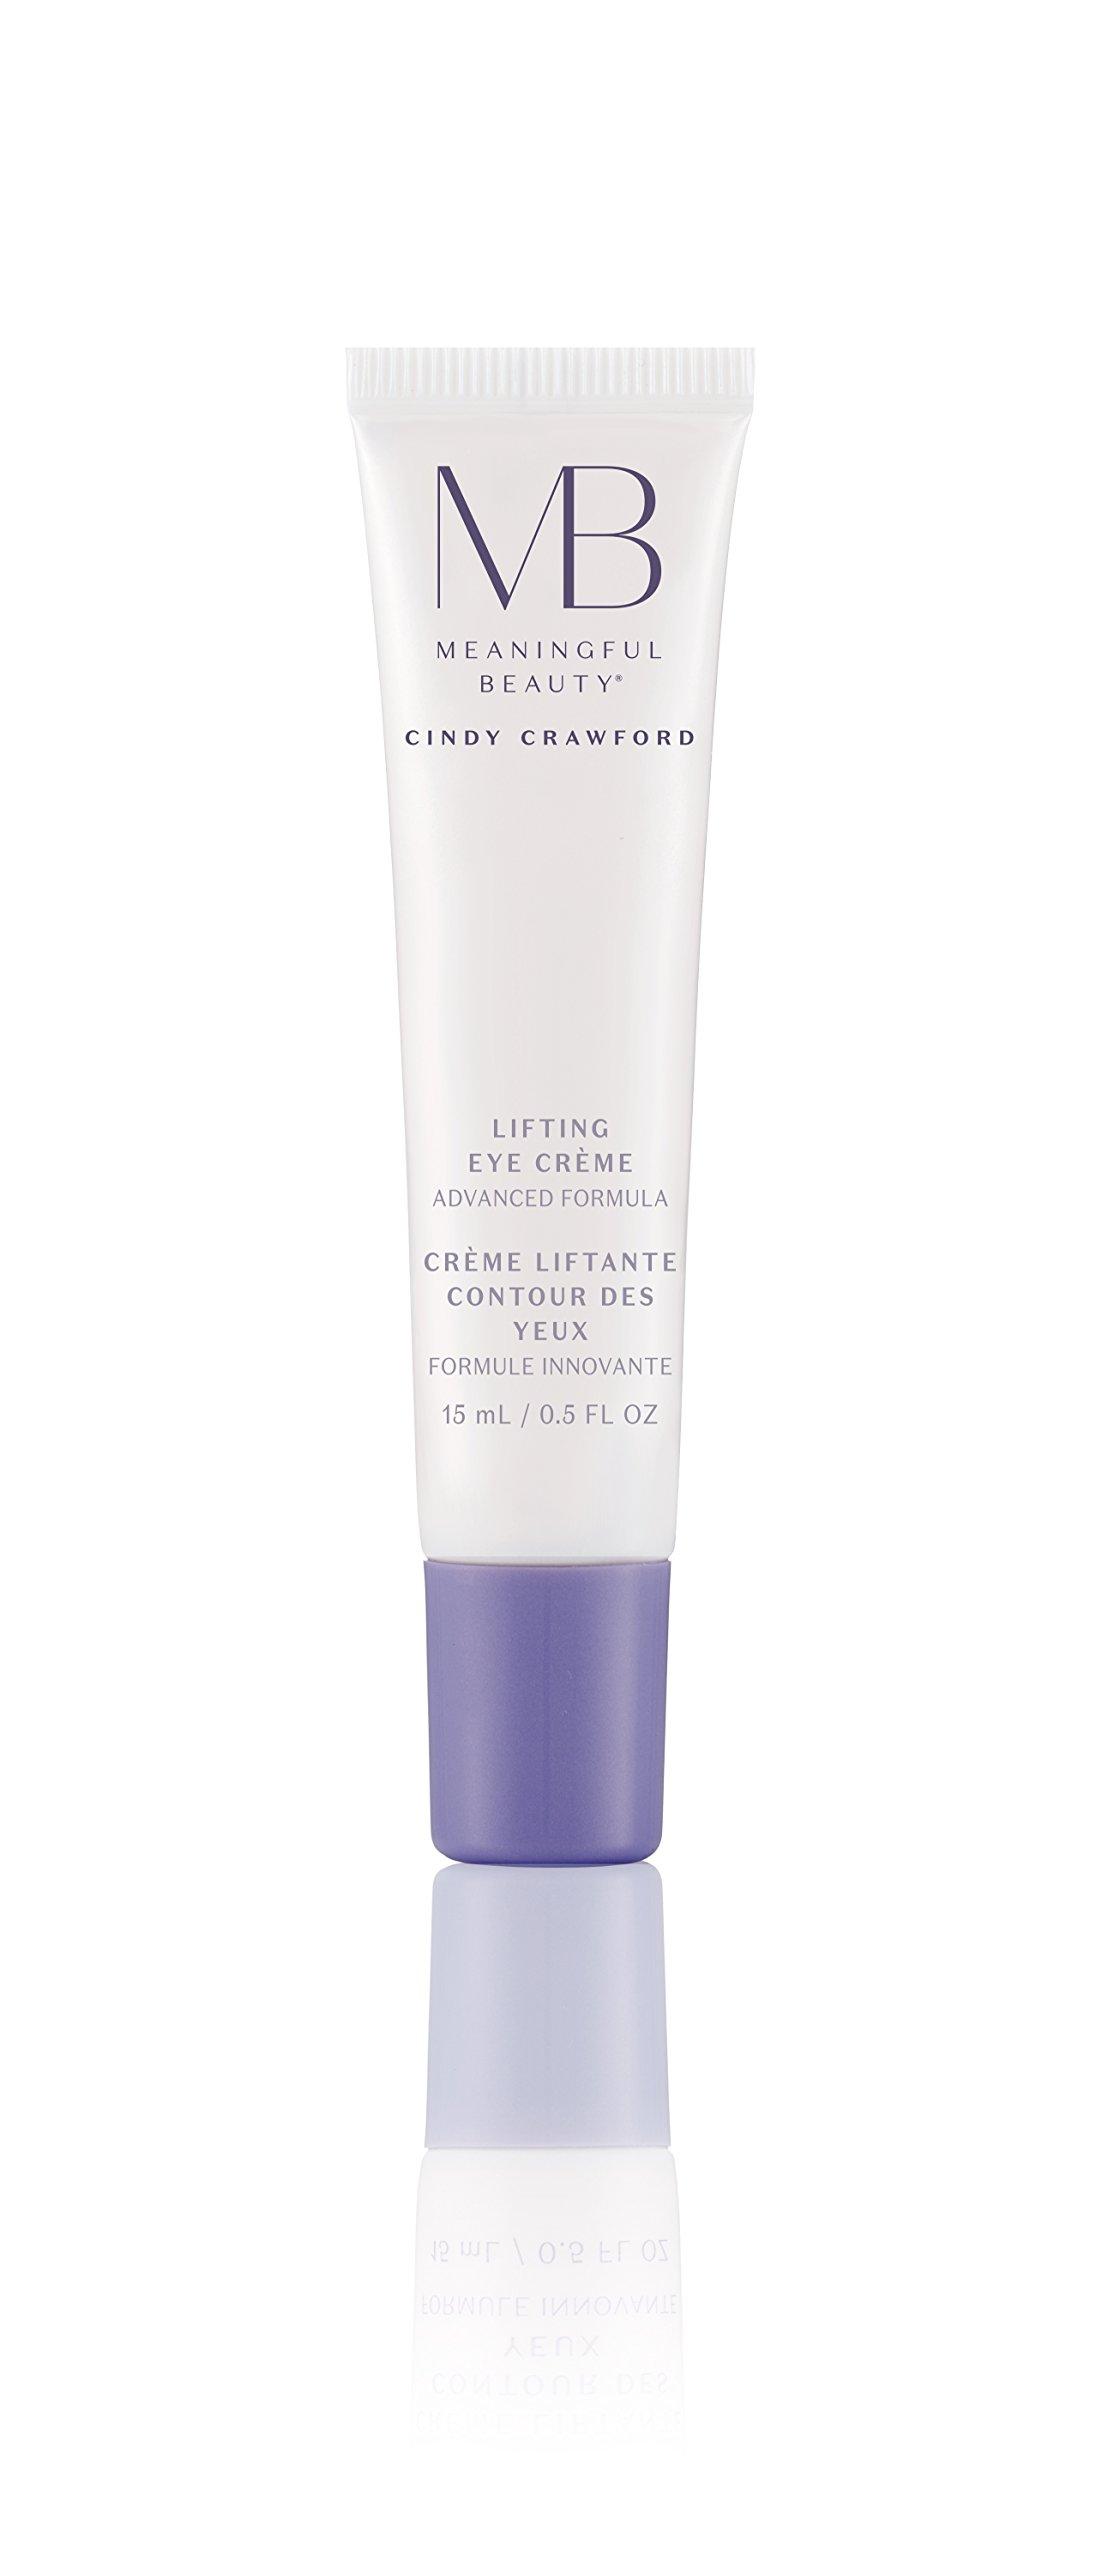 Meaningful Beauty - Lifting Eye Crème Advanced Formula - Under Eye Care - 0.5 Ounce - MT.2106